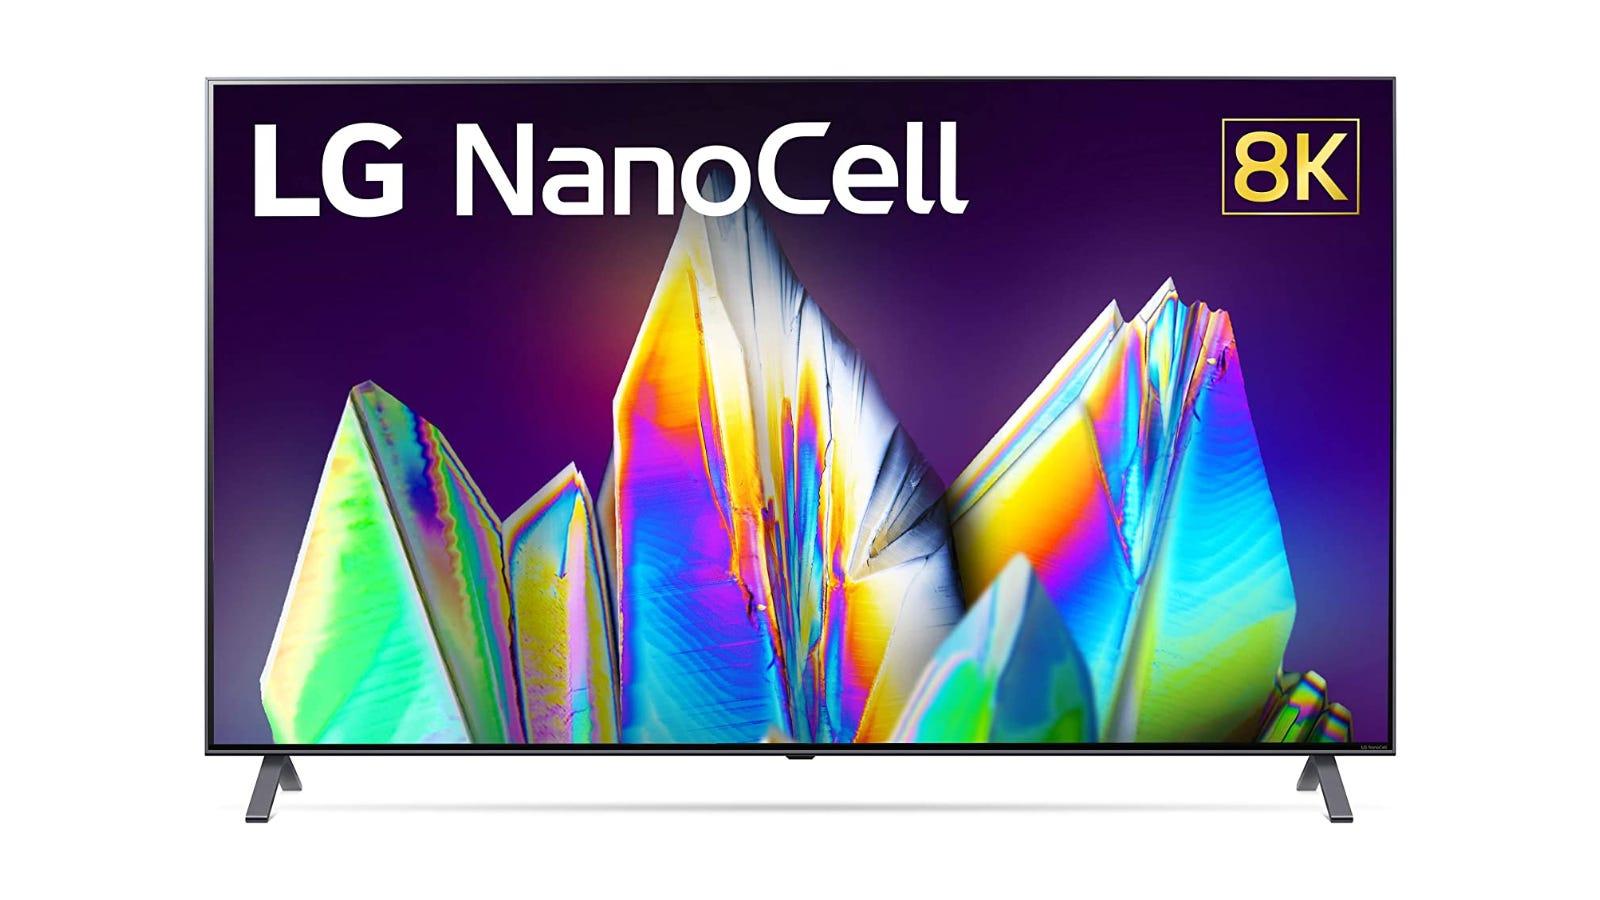 LG NanoCell 99 Series TV